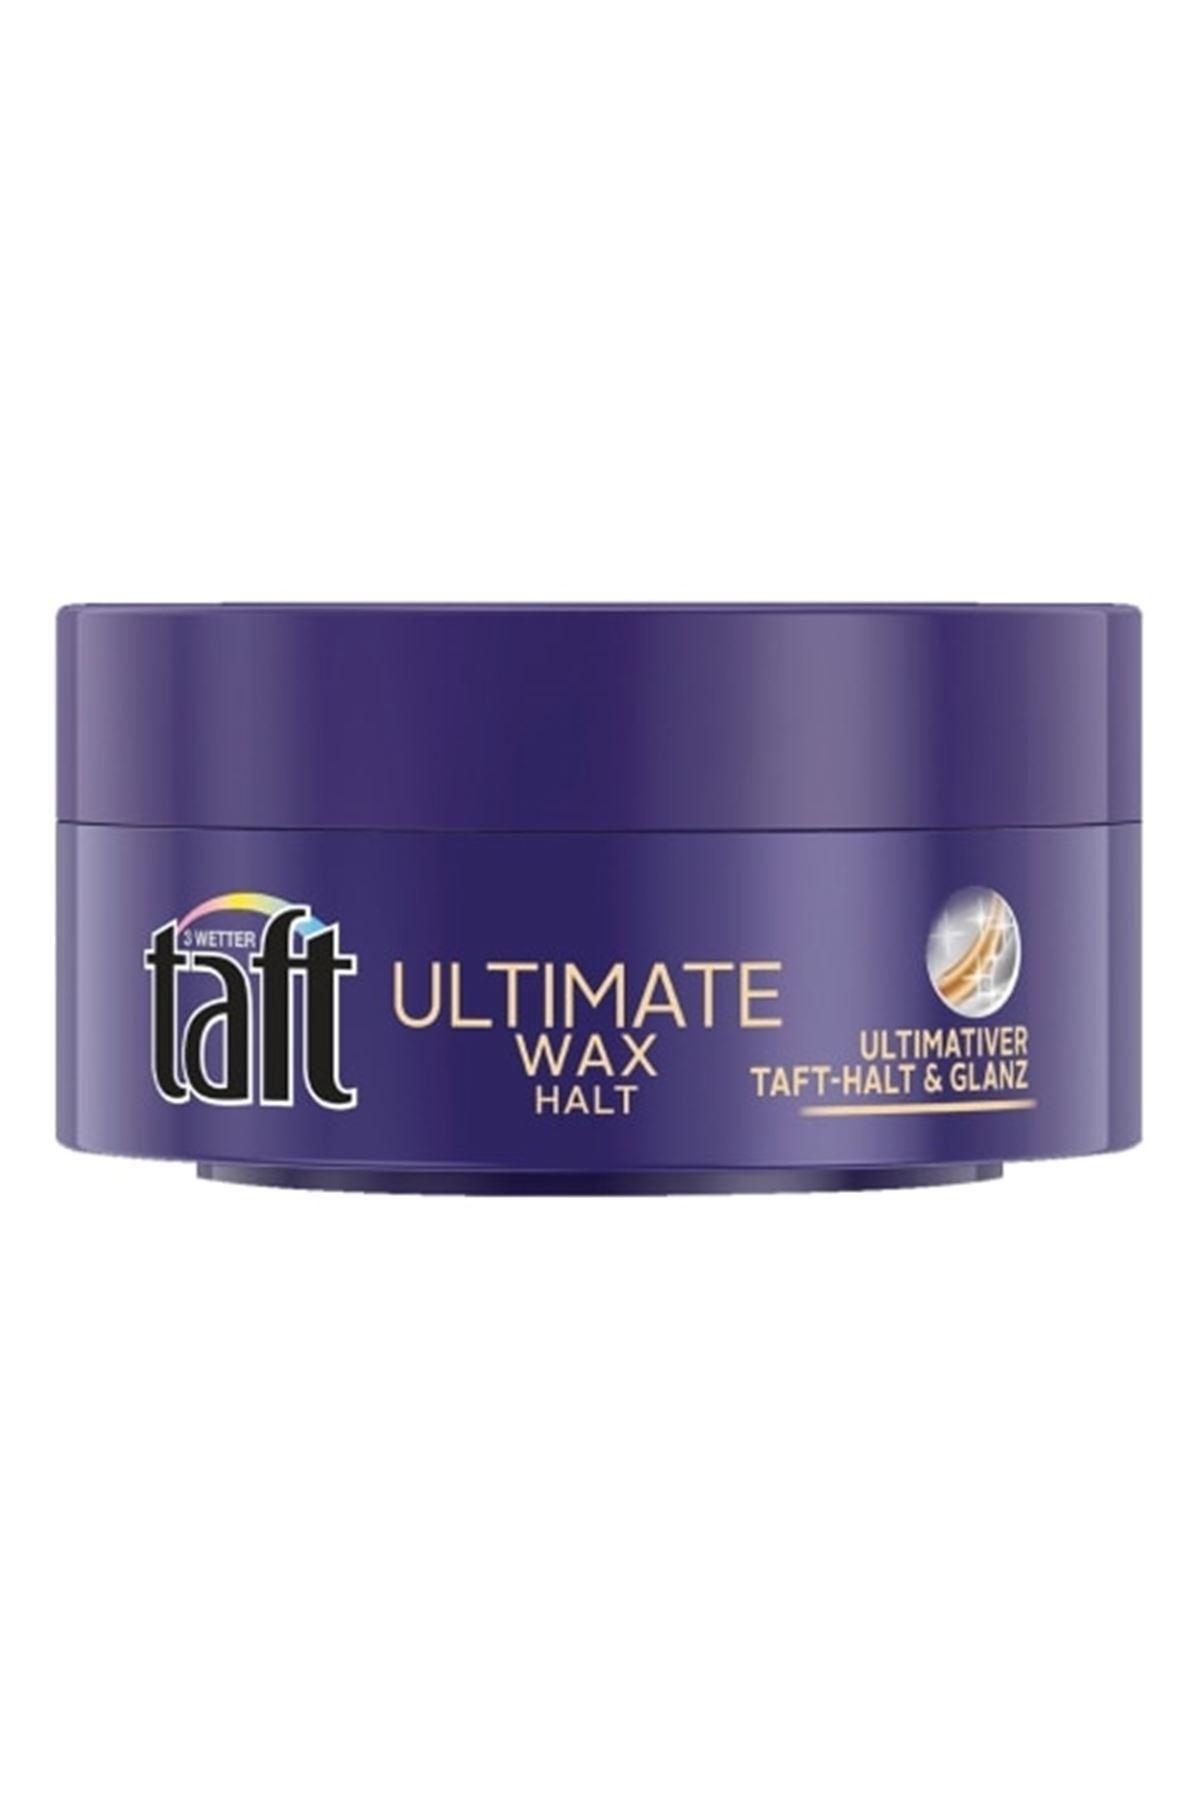 Taft Wax Ultimate 75ml